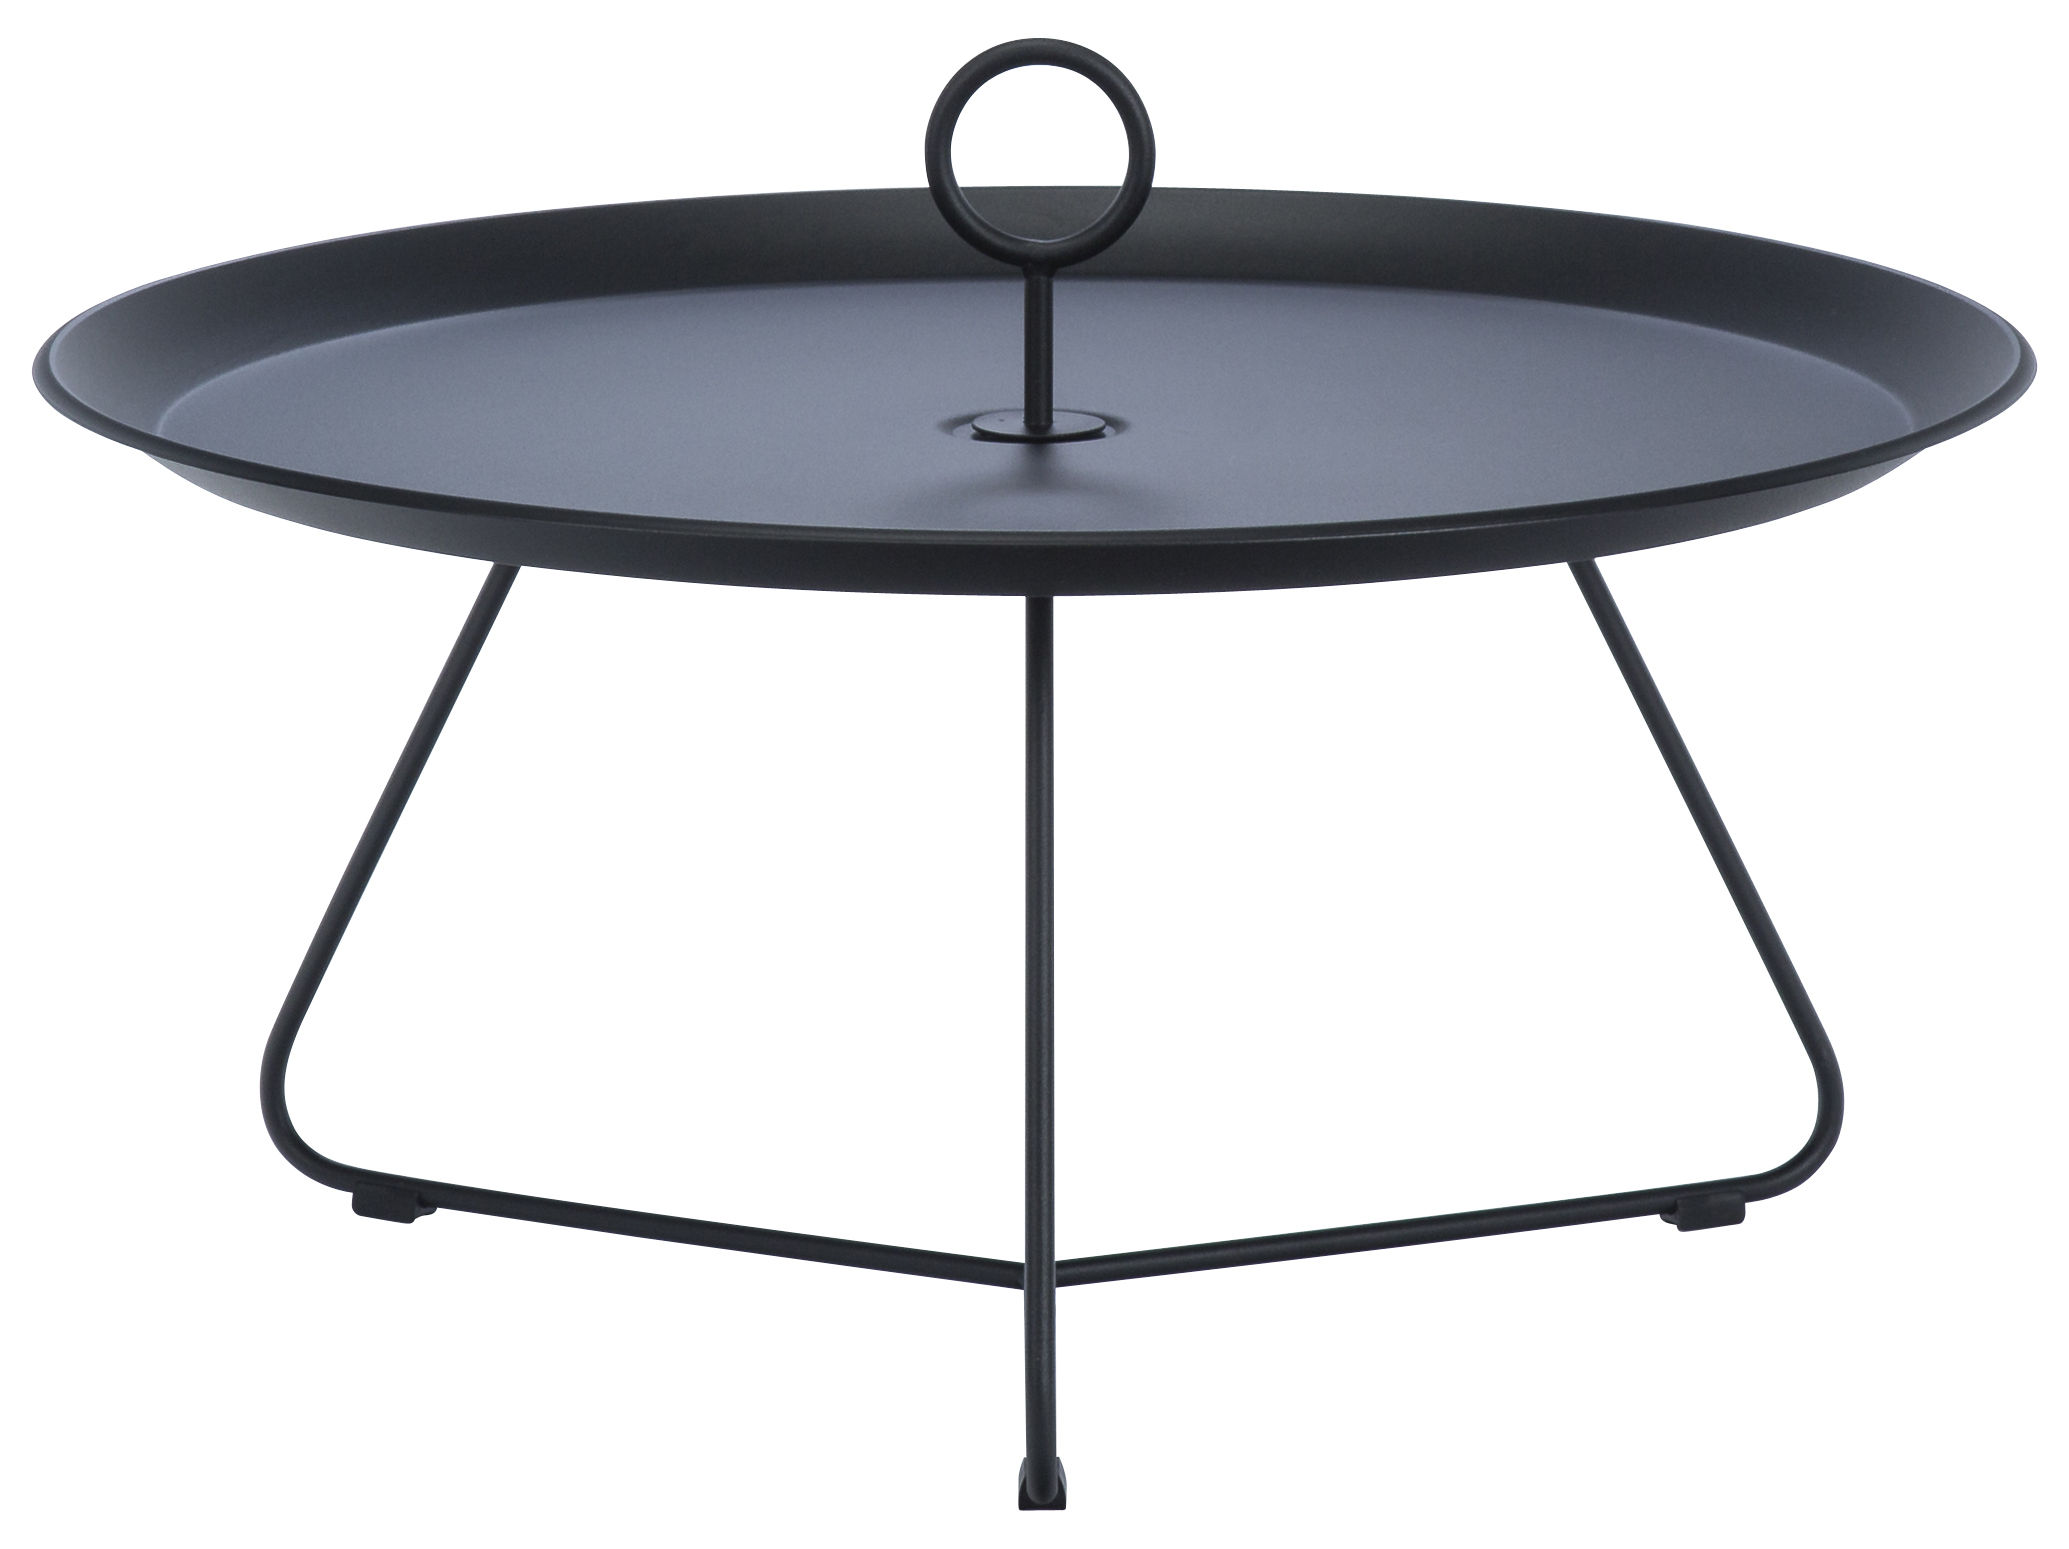 Arredamento - Tavolini  - Tavolino basso Eyelet Large / Ø 80 x H 35 cm - Houe - Nero - Metallo rivestito in resina epossidica